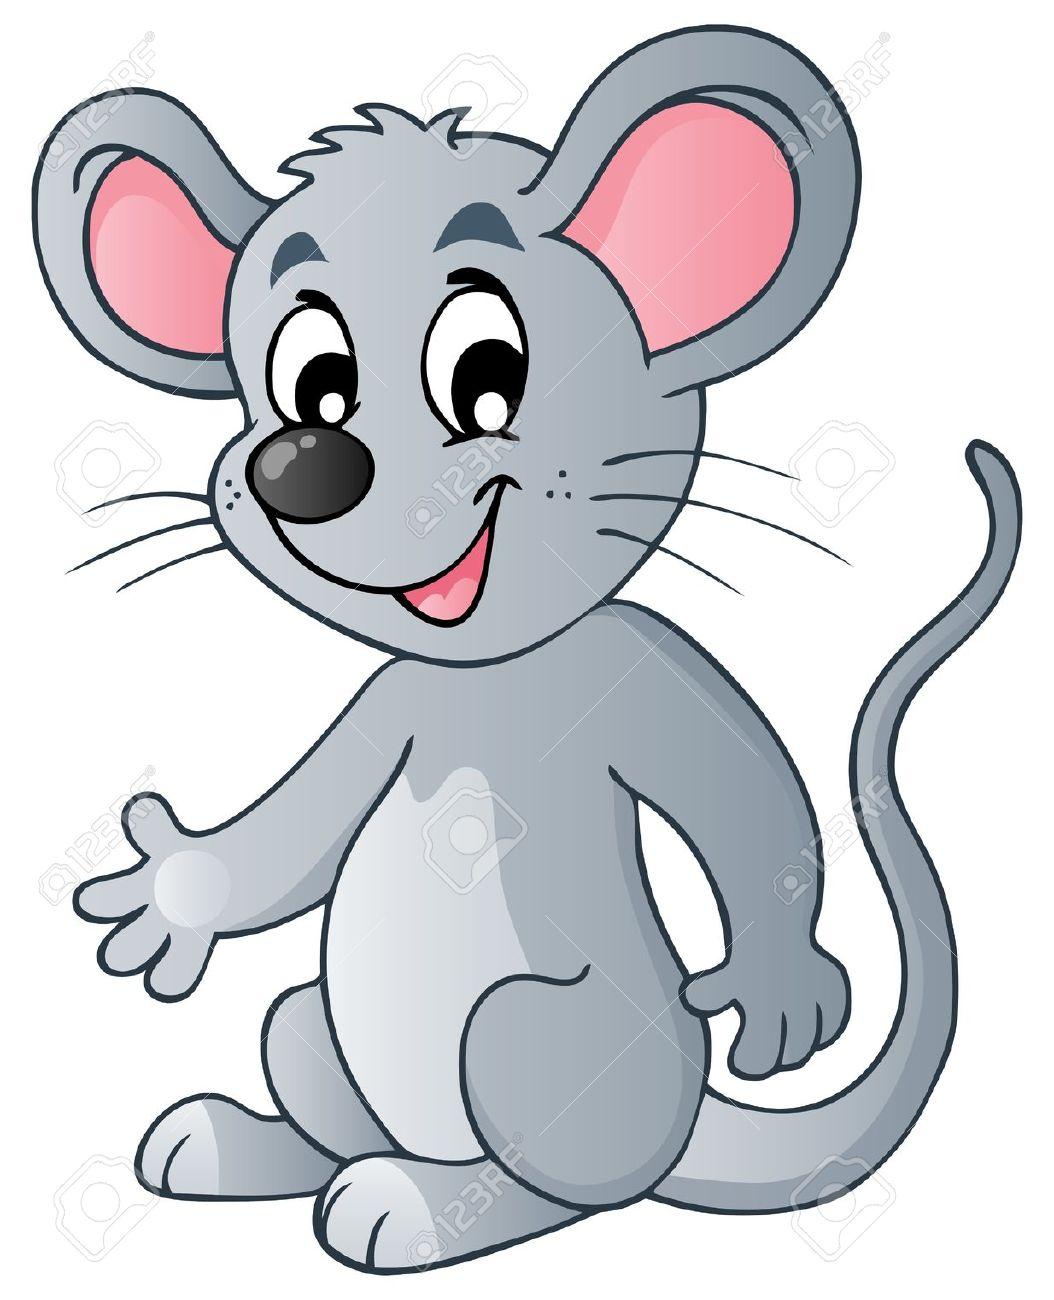 Cute Cartoon Mouse.